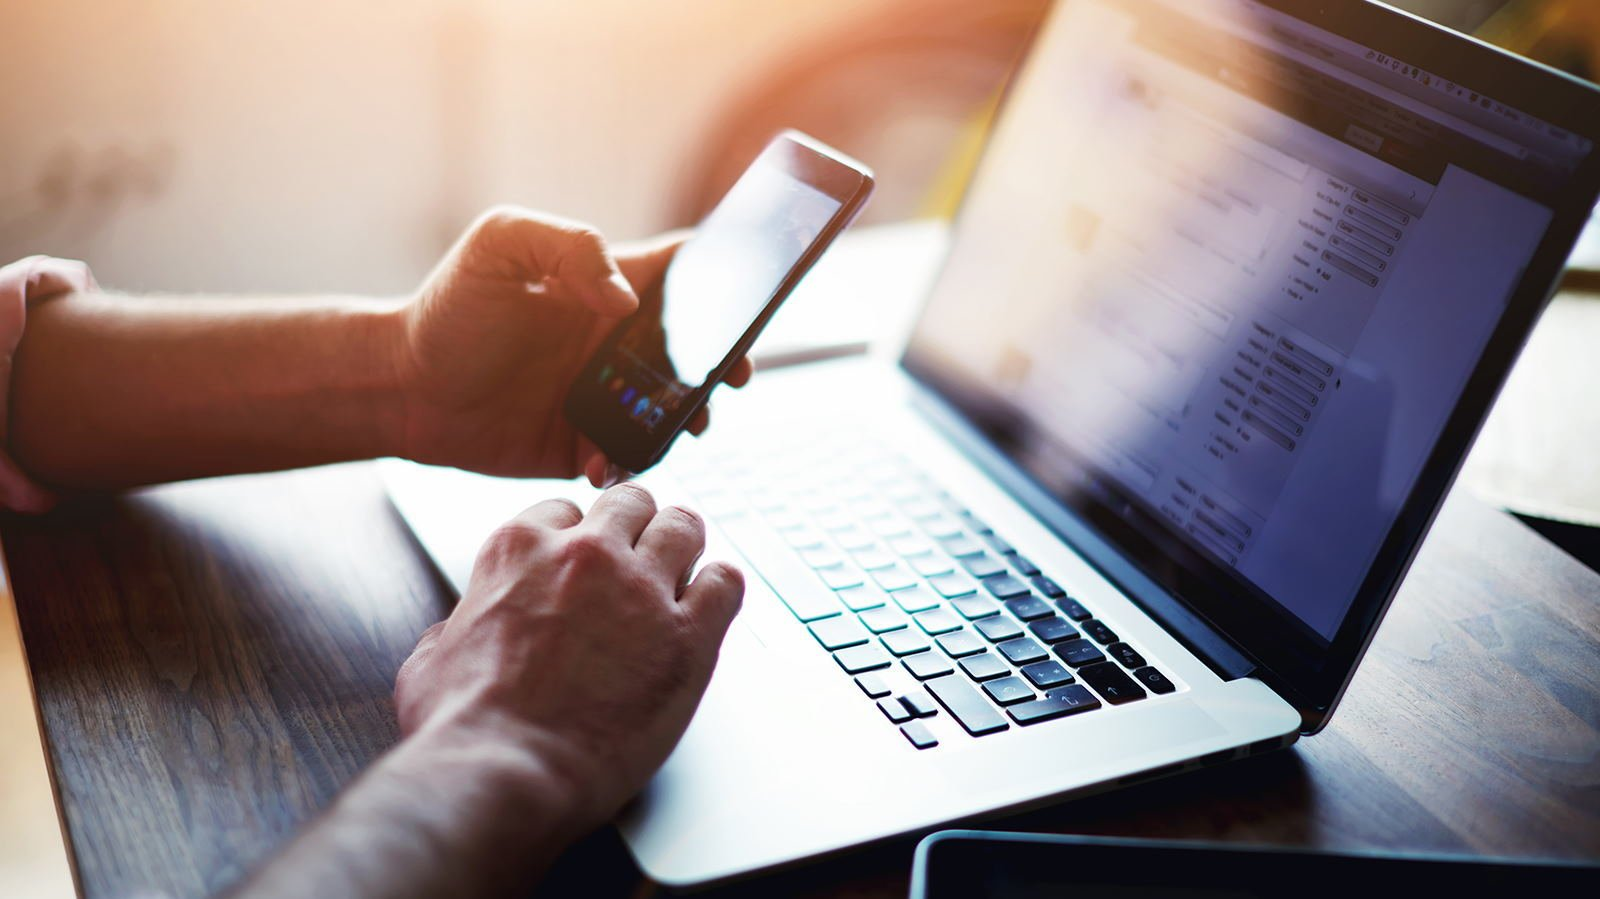 Kode Bank Bca Untuk Transfer Antar Bank Melalui Mesin Atm Tirto Id